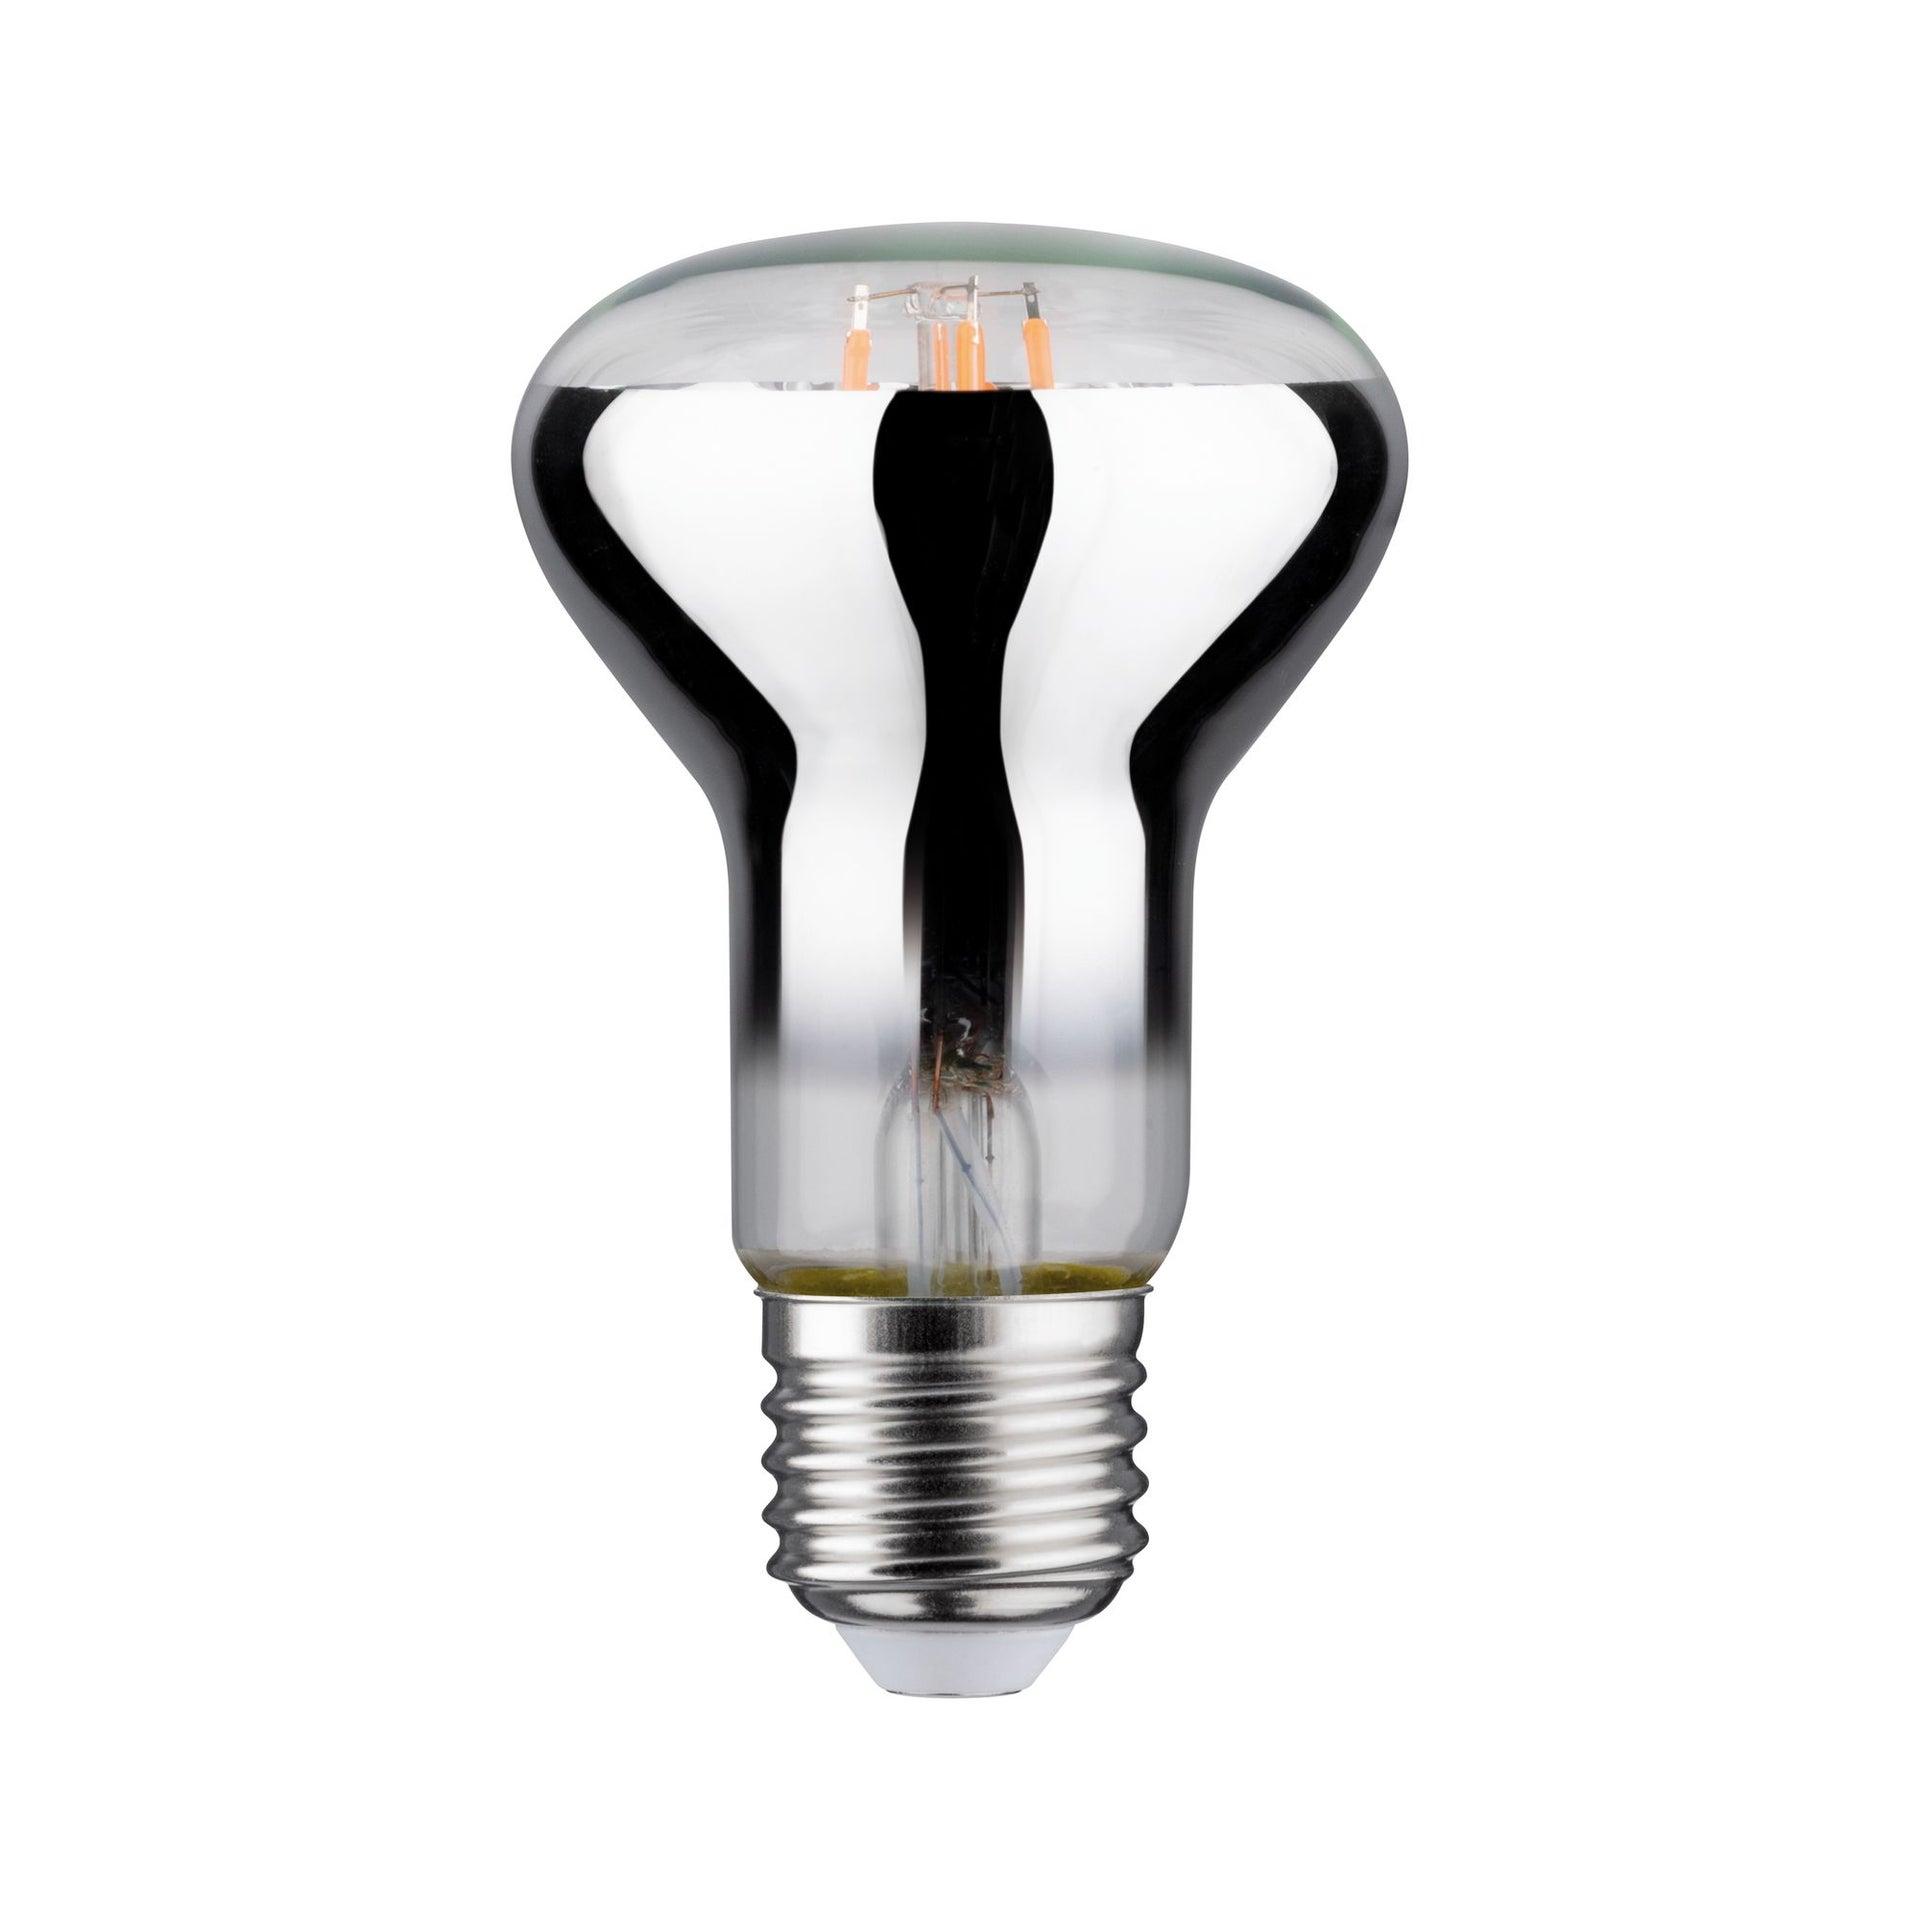 Ampoule Horticole Led E27 200 Lm 6 W Blanc Chaud Paulmann Leroy Merlin